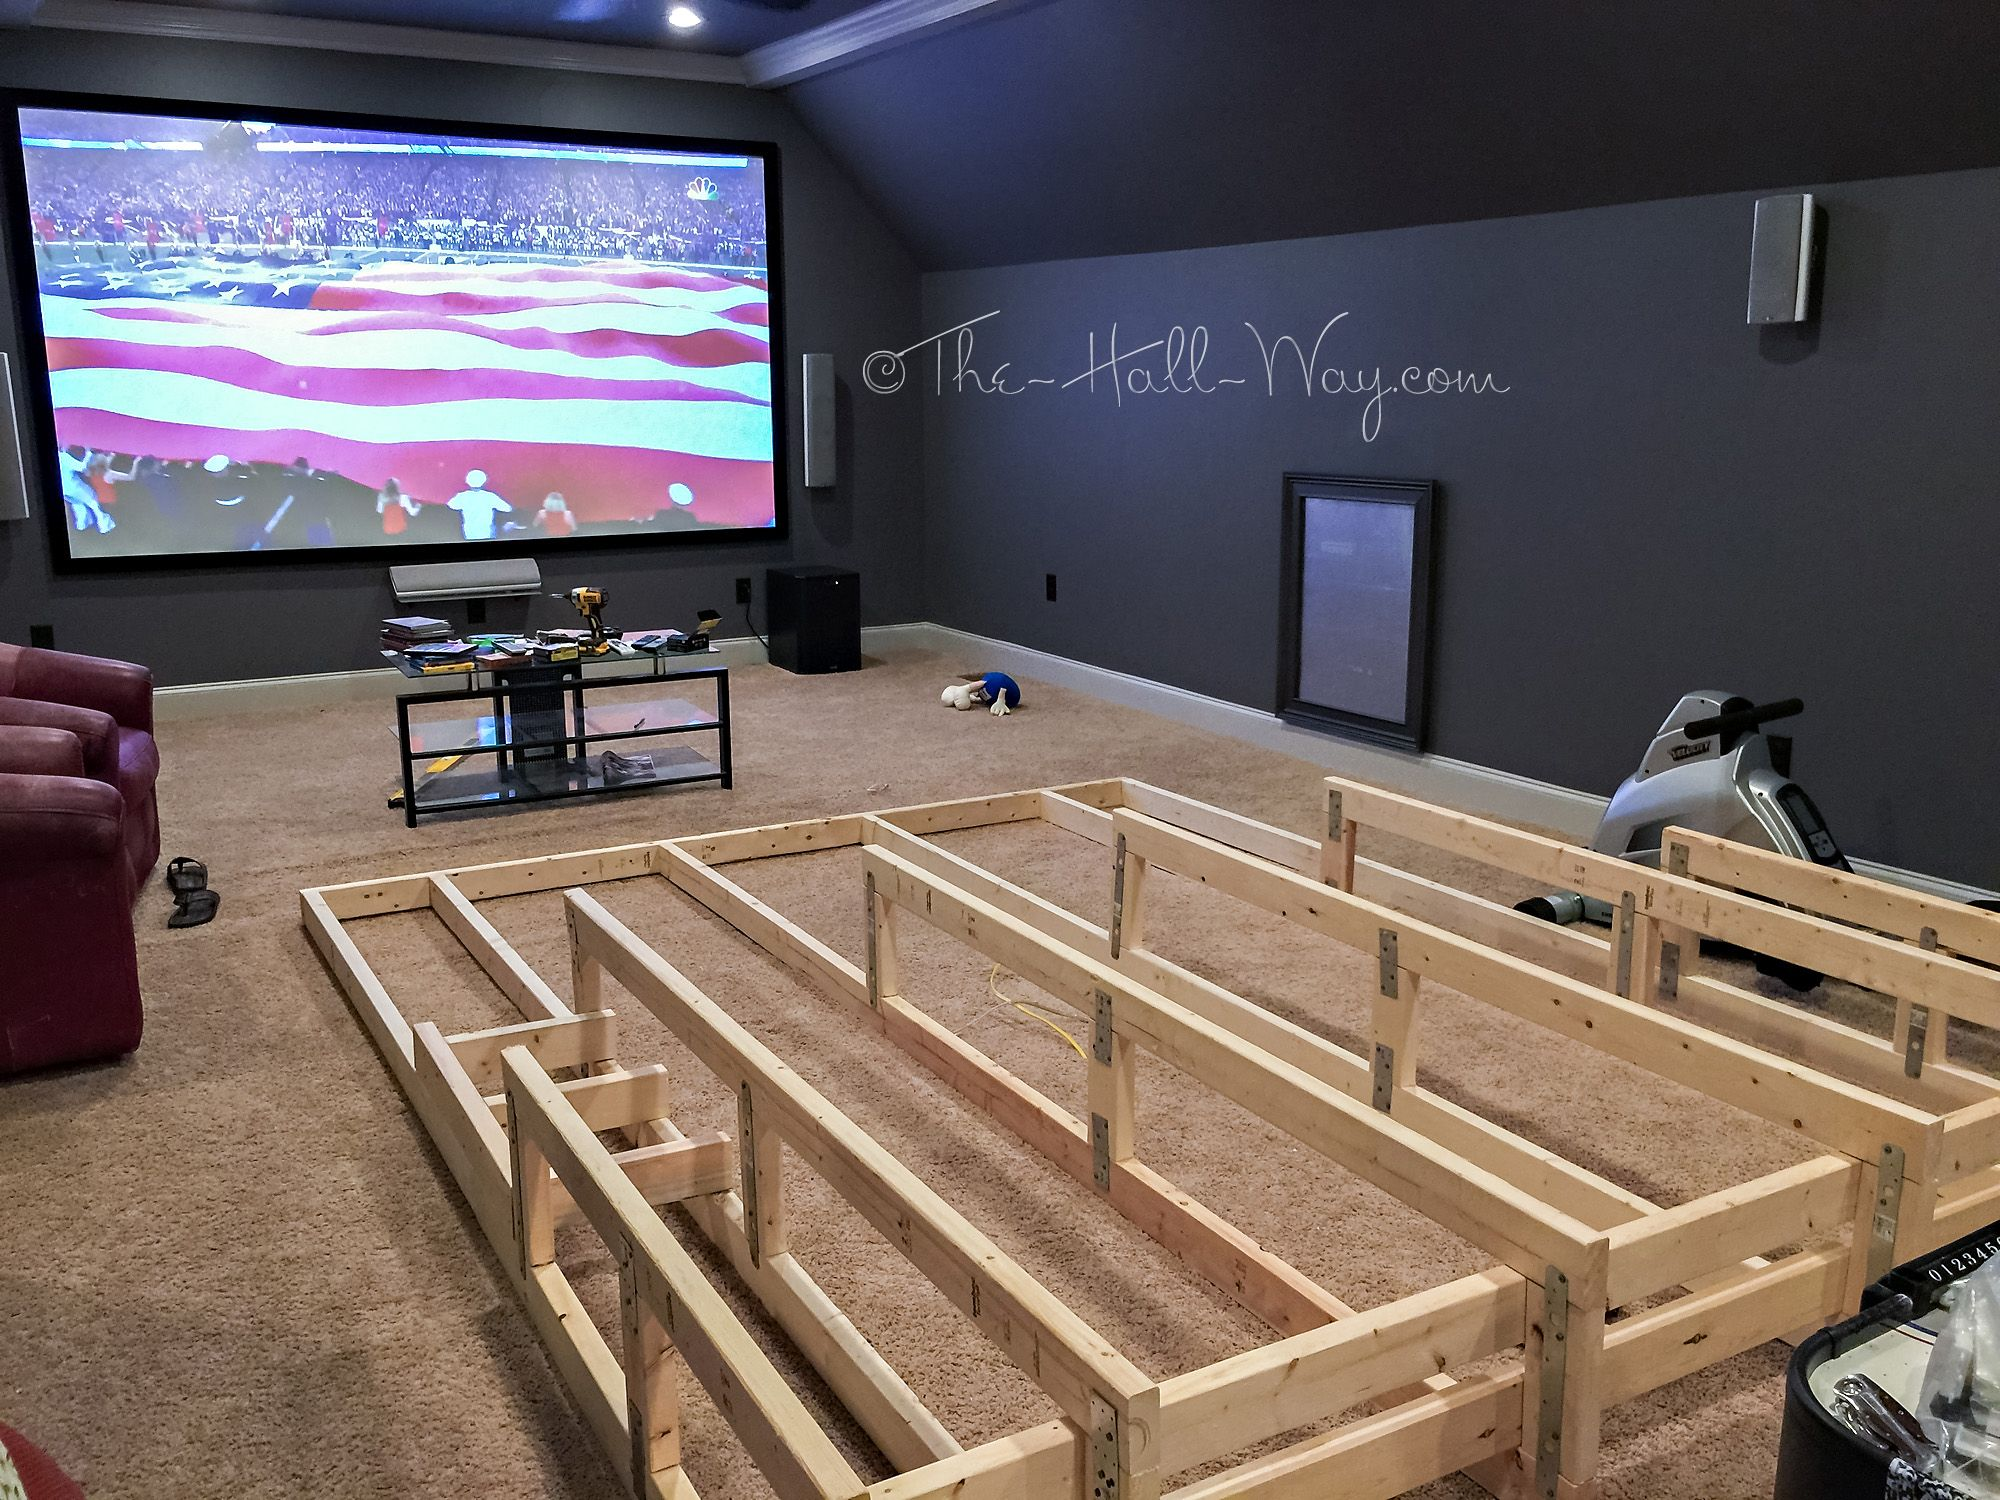 Media/ home theater riser DIY I would add running lights ...